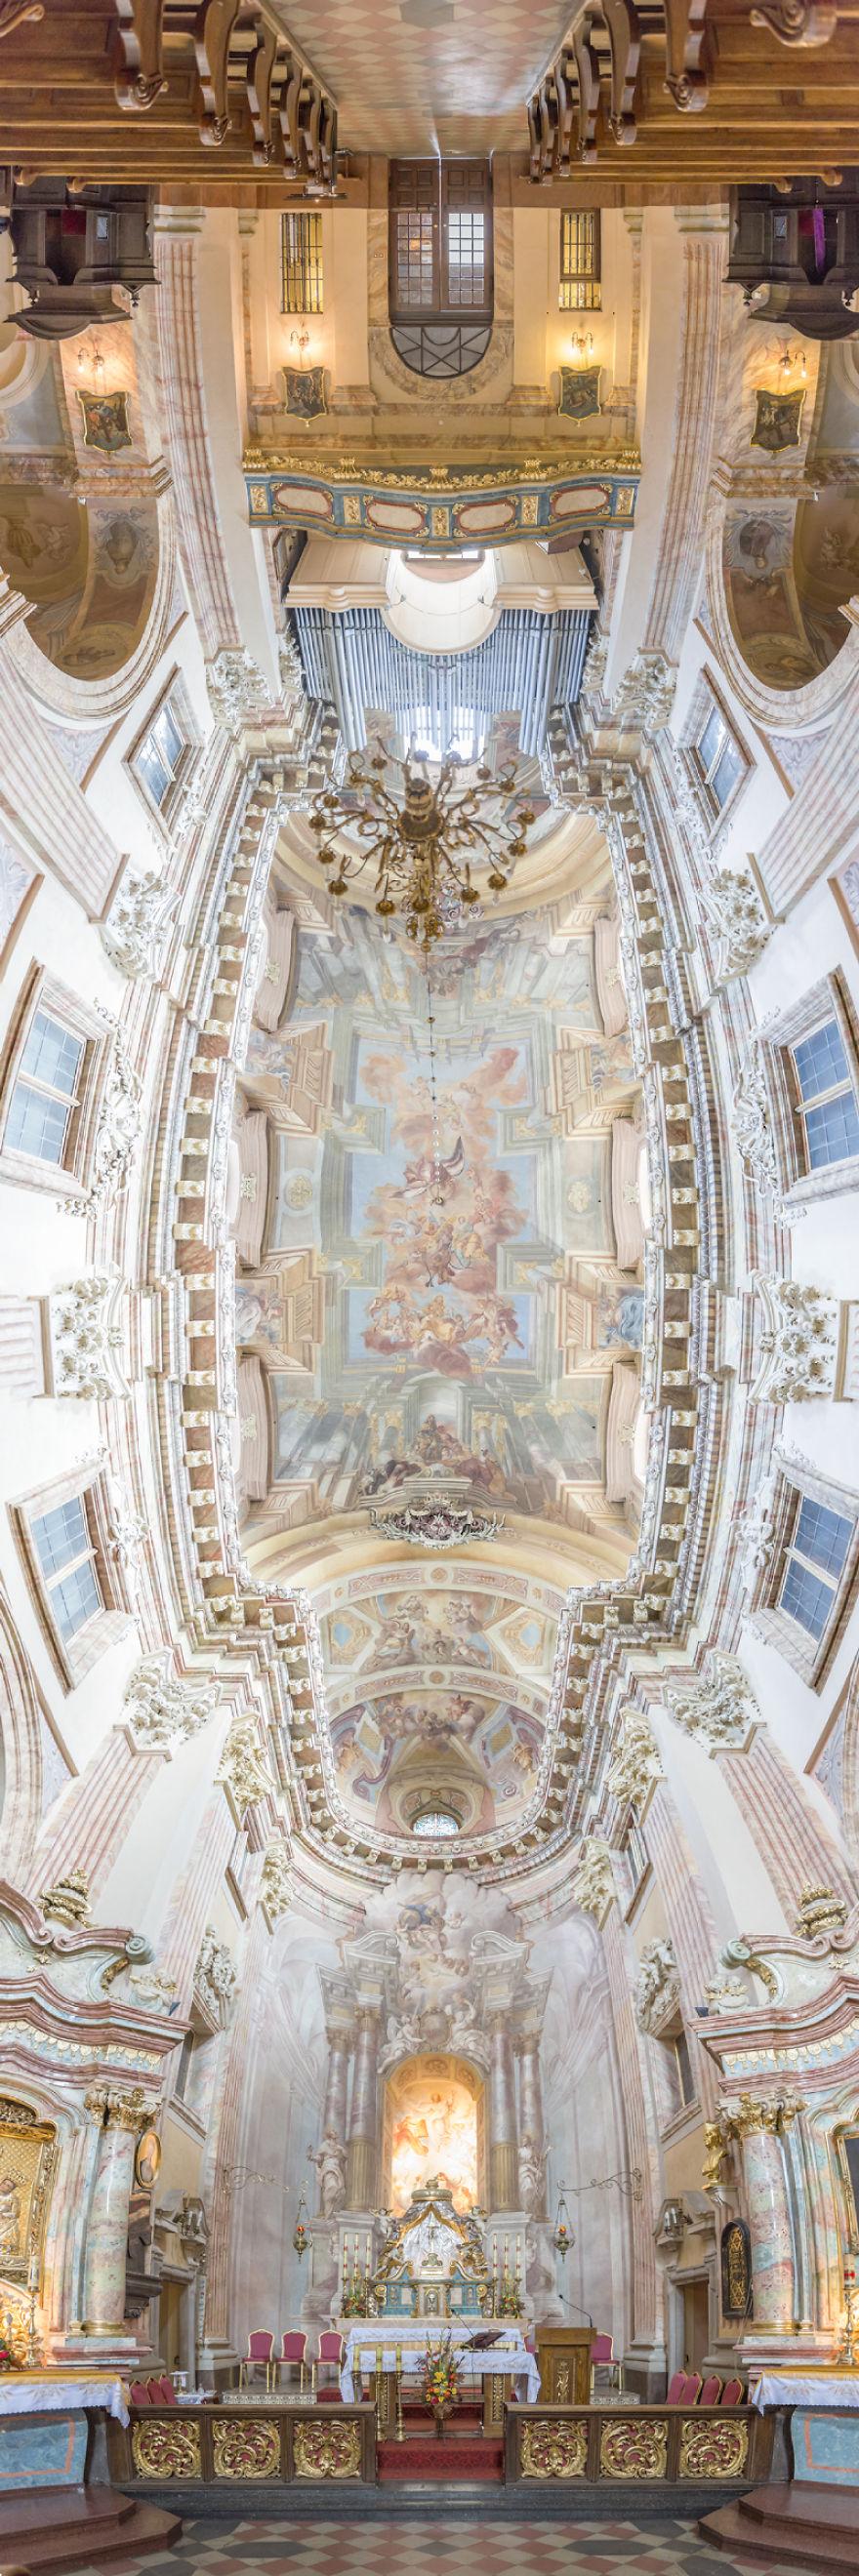 catedrales fotografiadas vertical 4